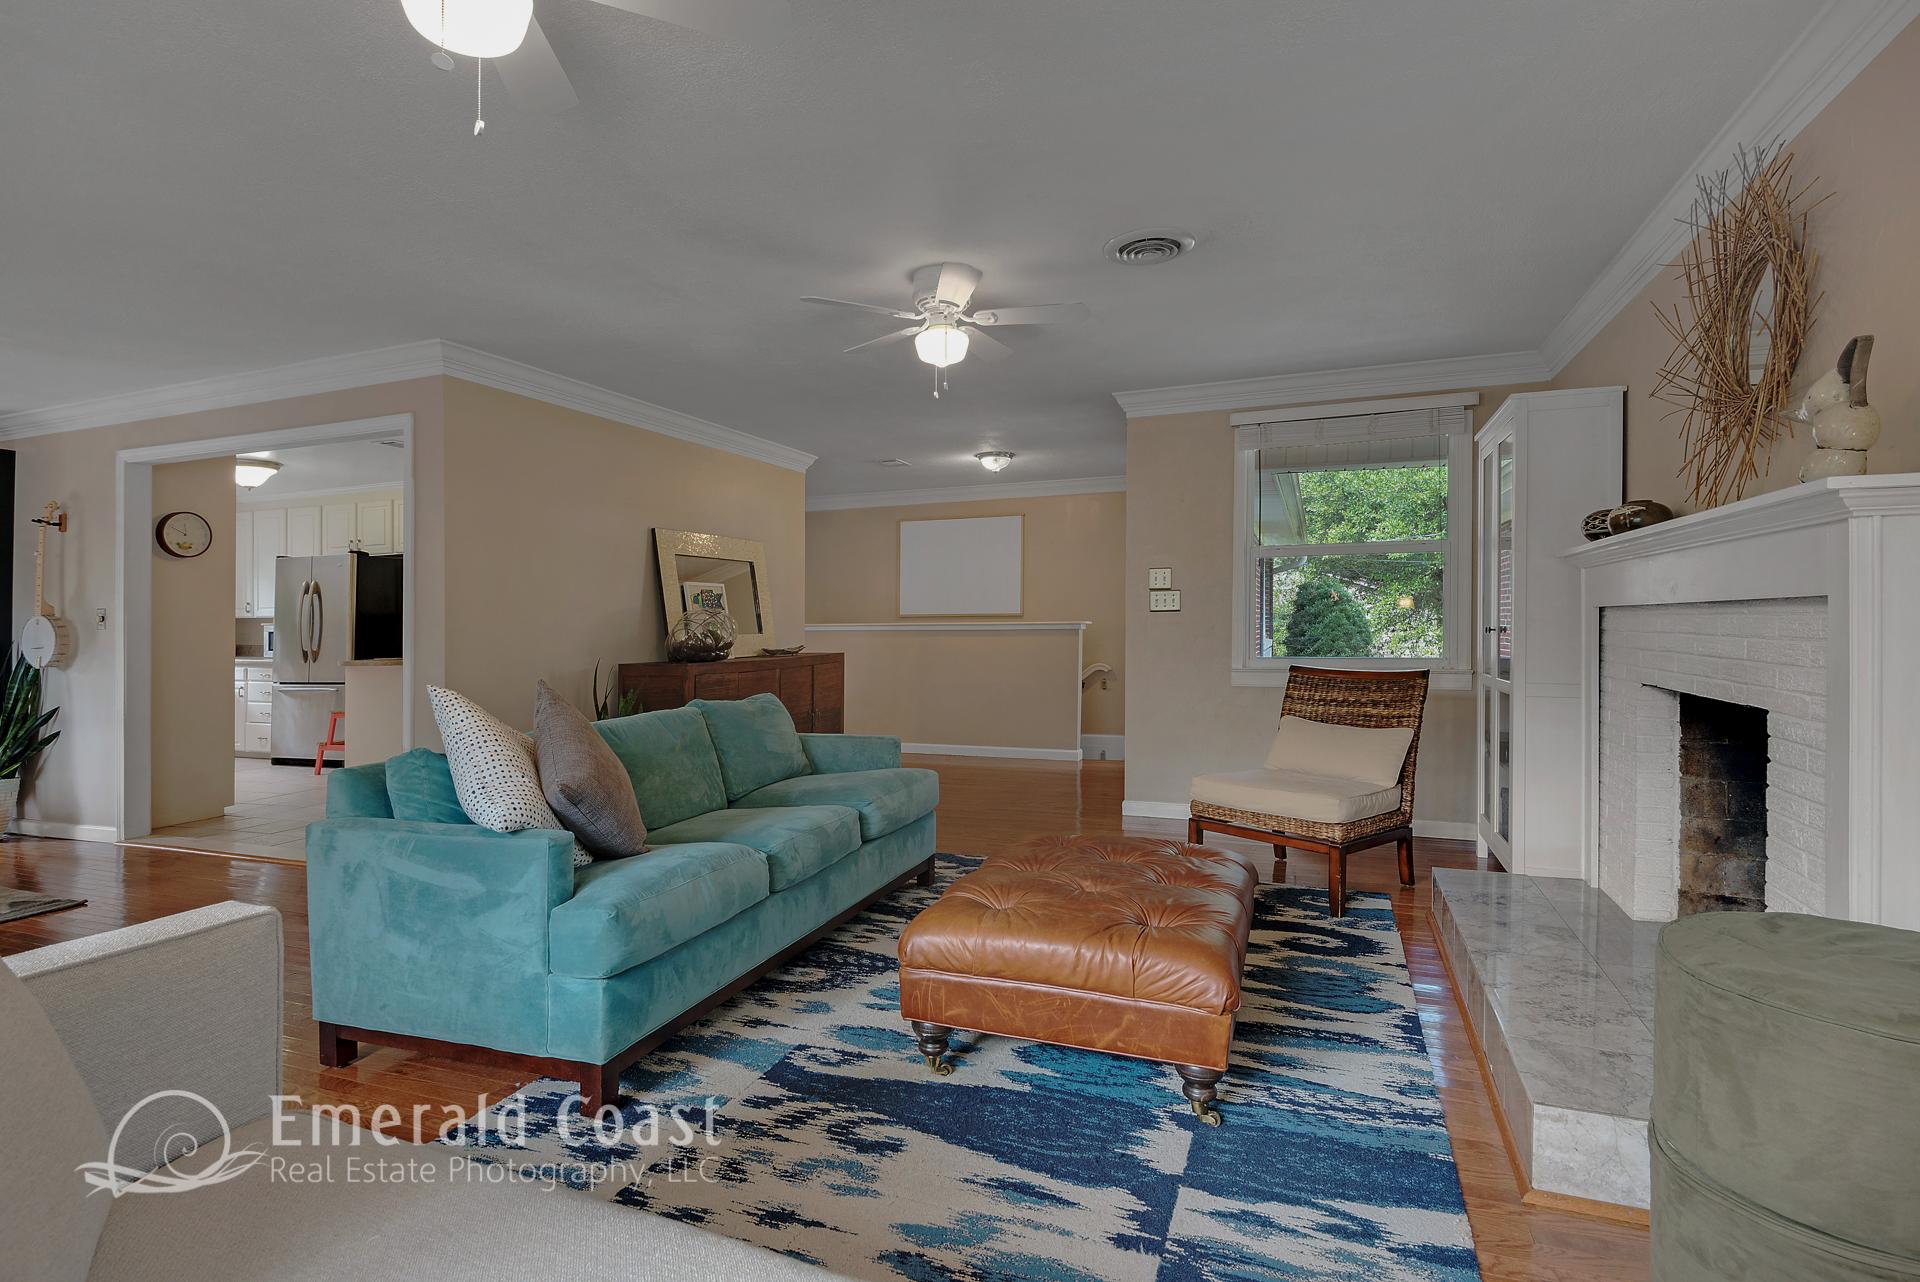 Craigslist Fort Walton Beach >> Emerald Coast Real Estate Photography » Pensacola Real ...